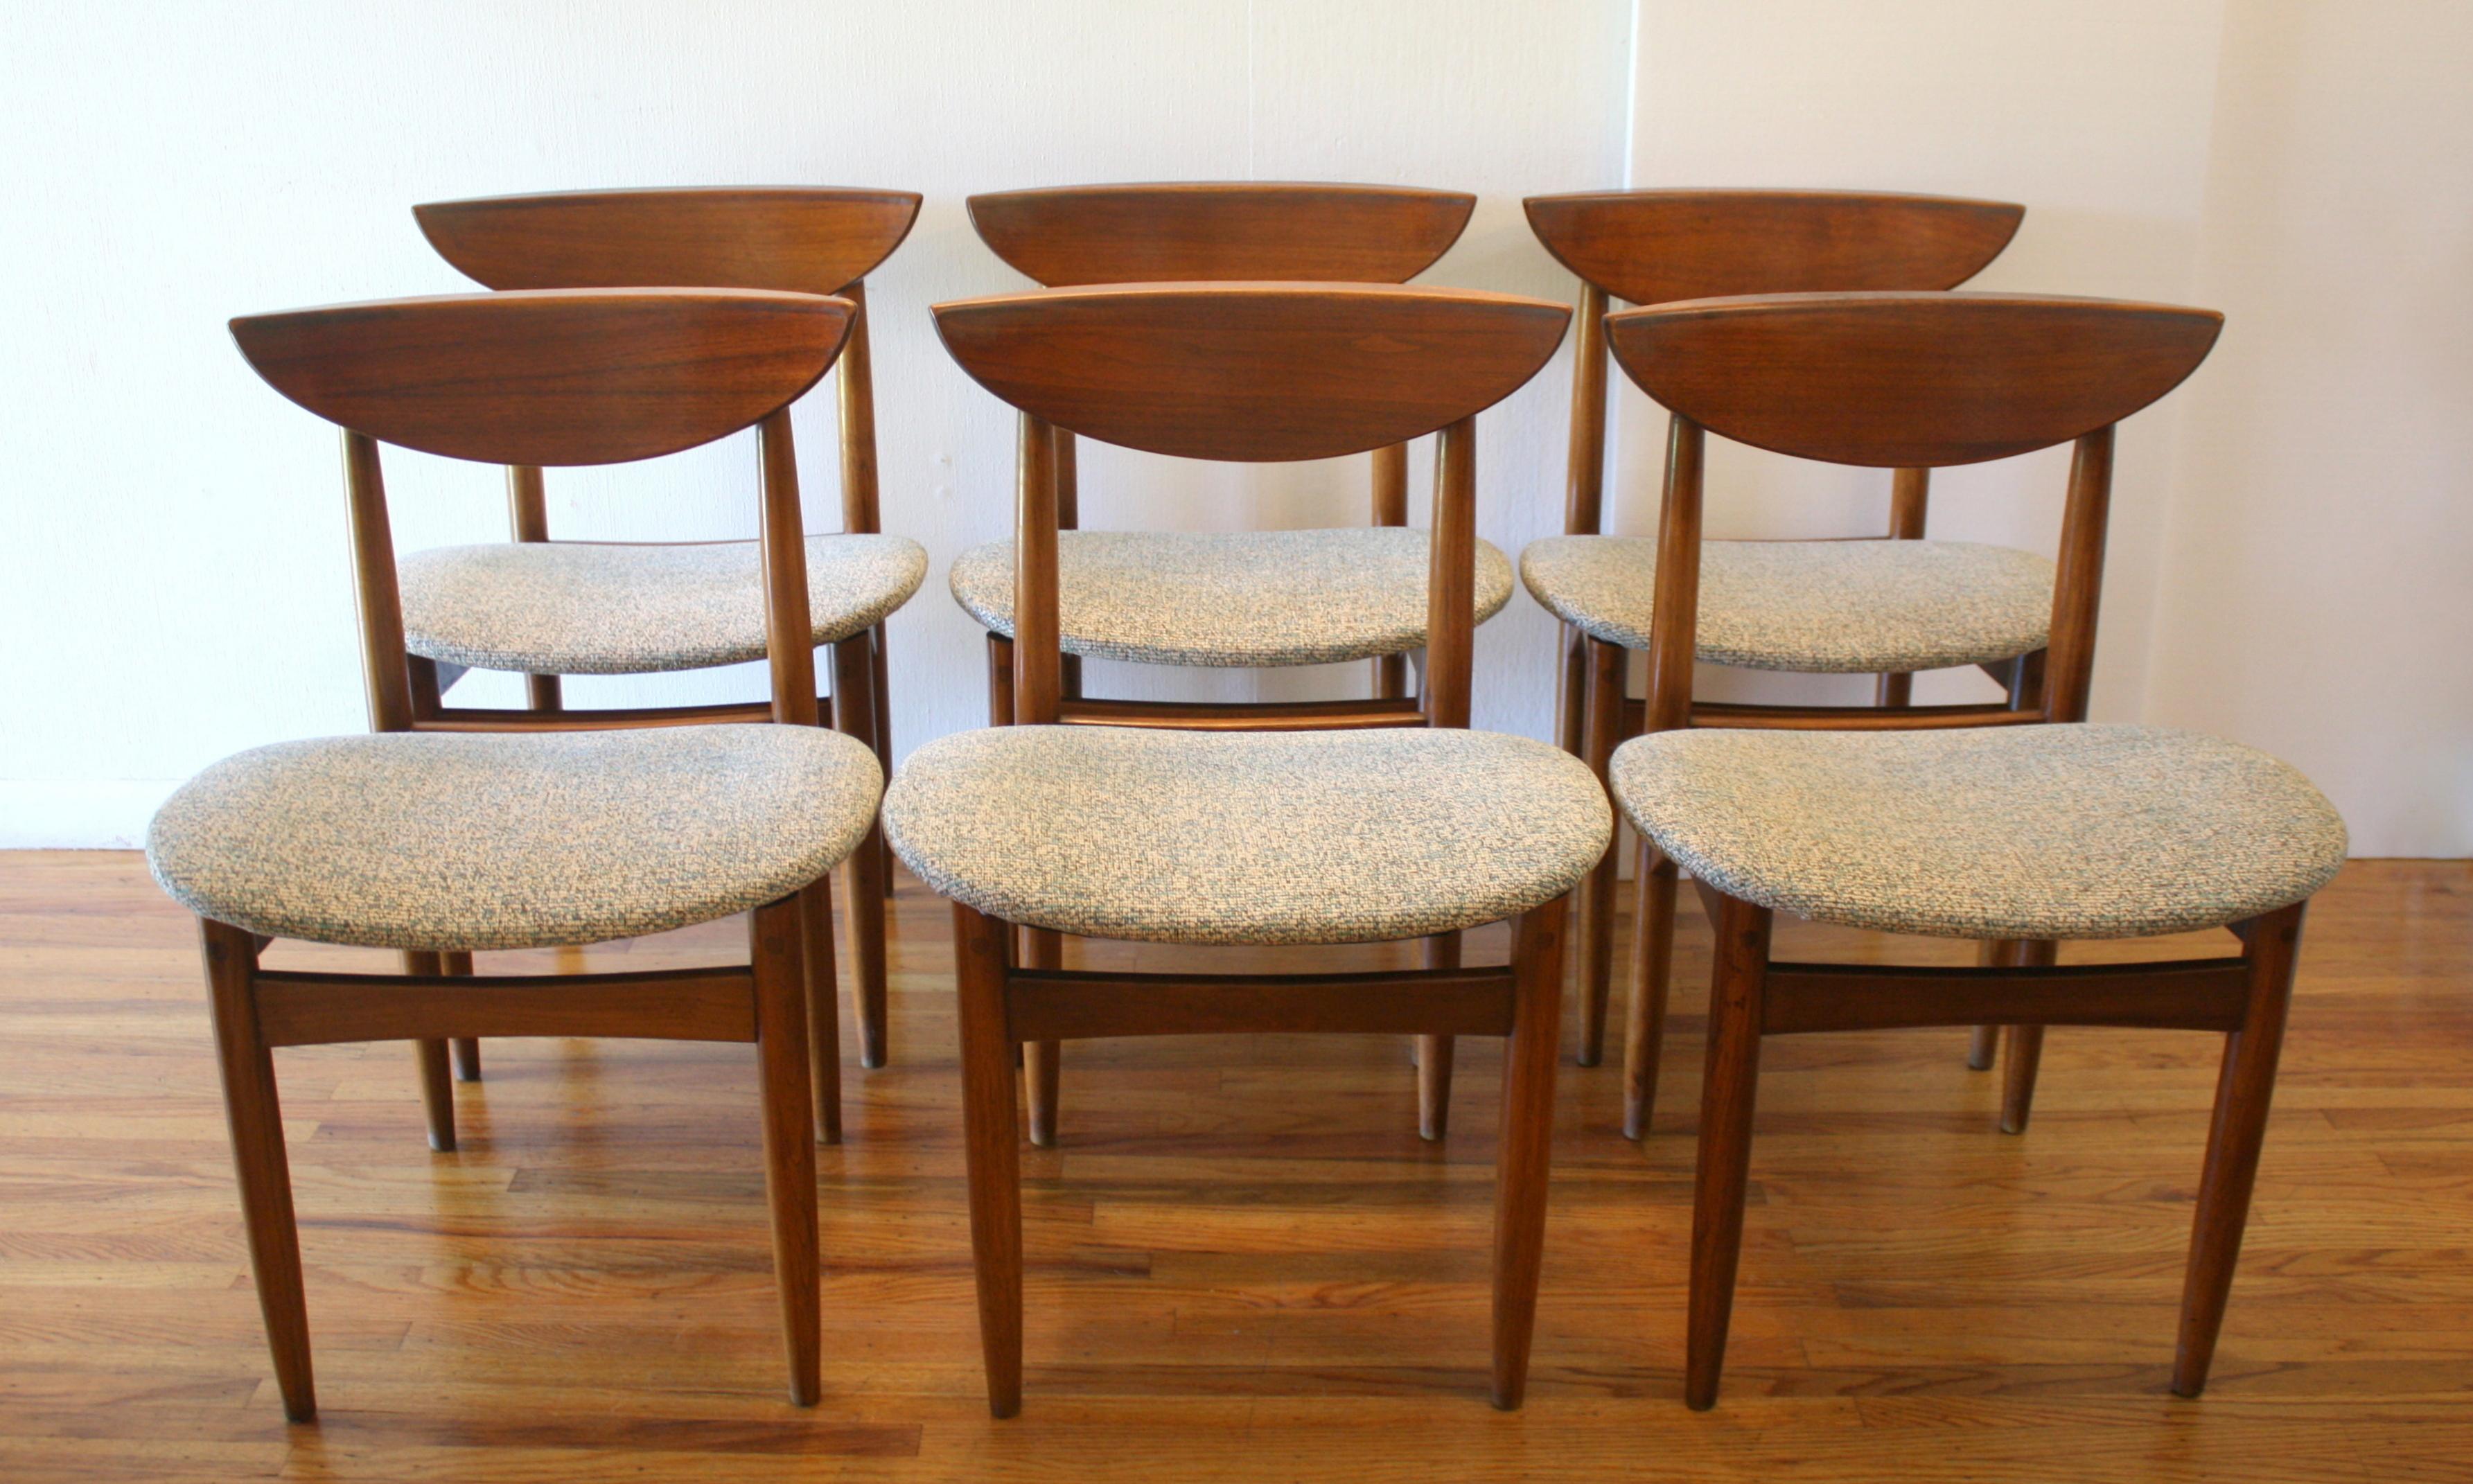 https://pickedvintage.files.wordpress.com/2017/05/lane-dining-chairs-1.jpg